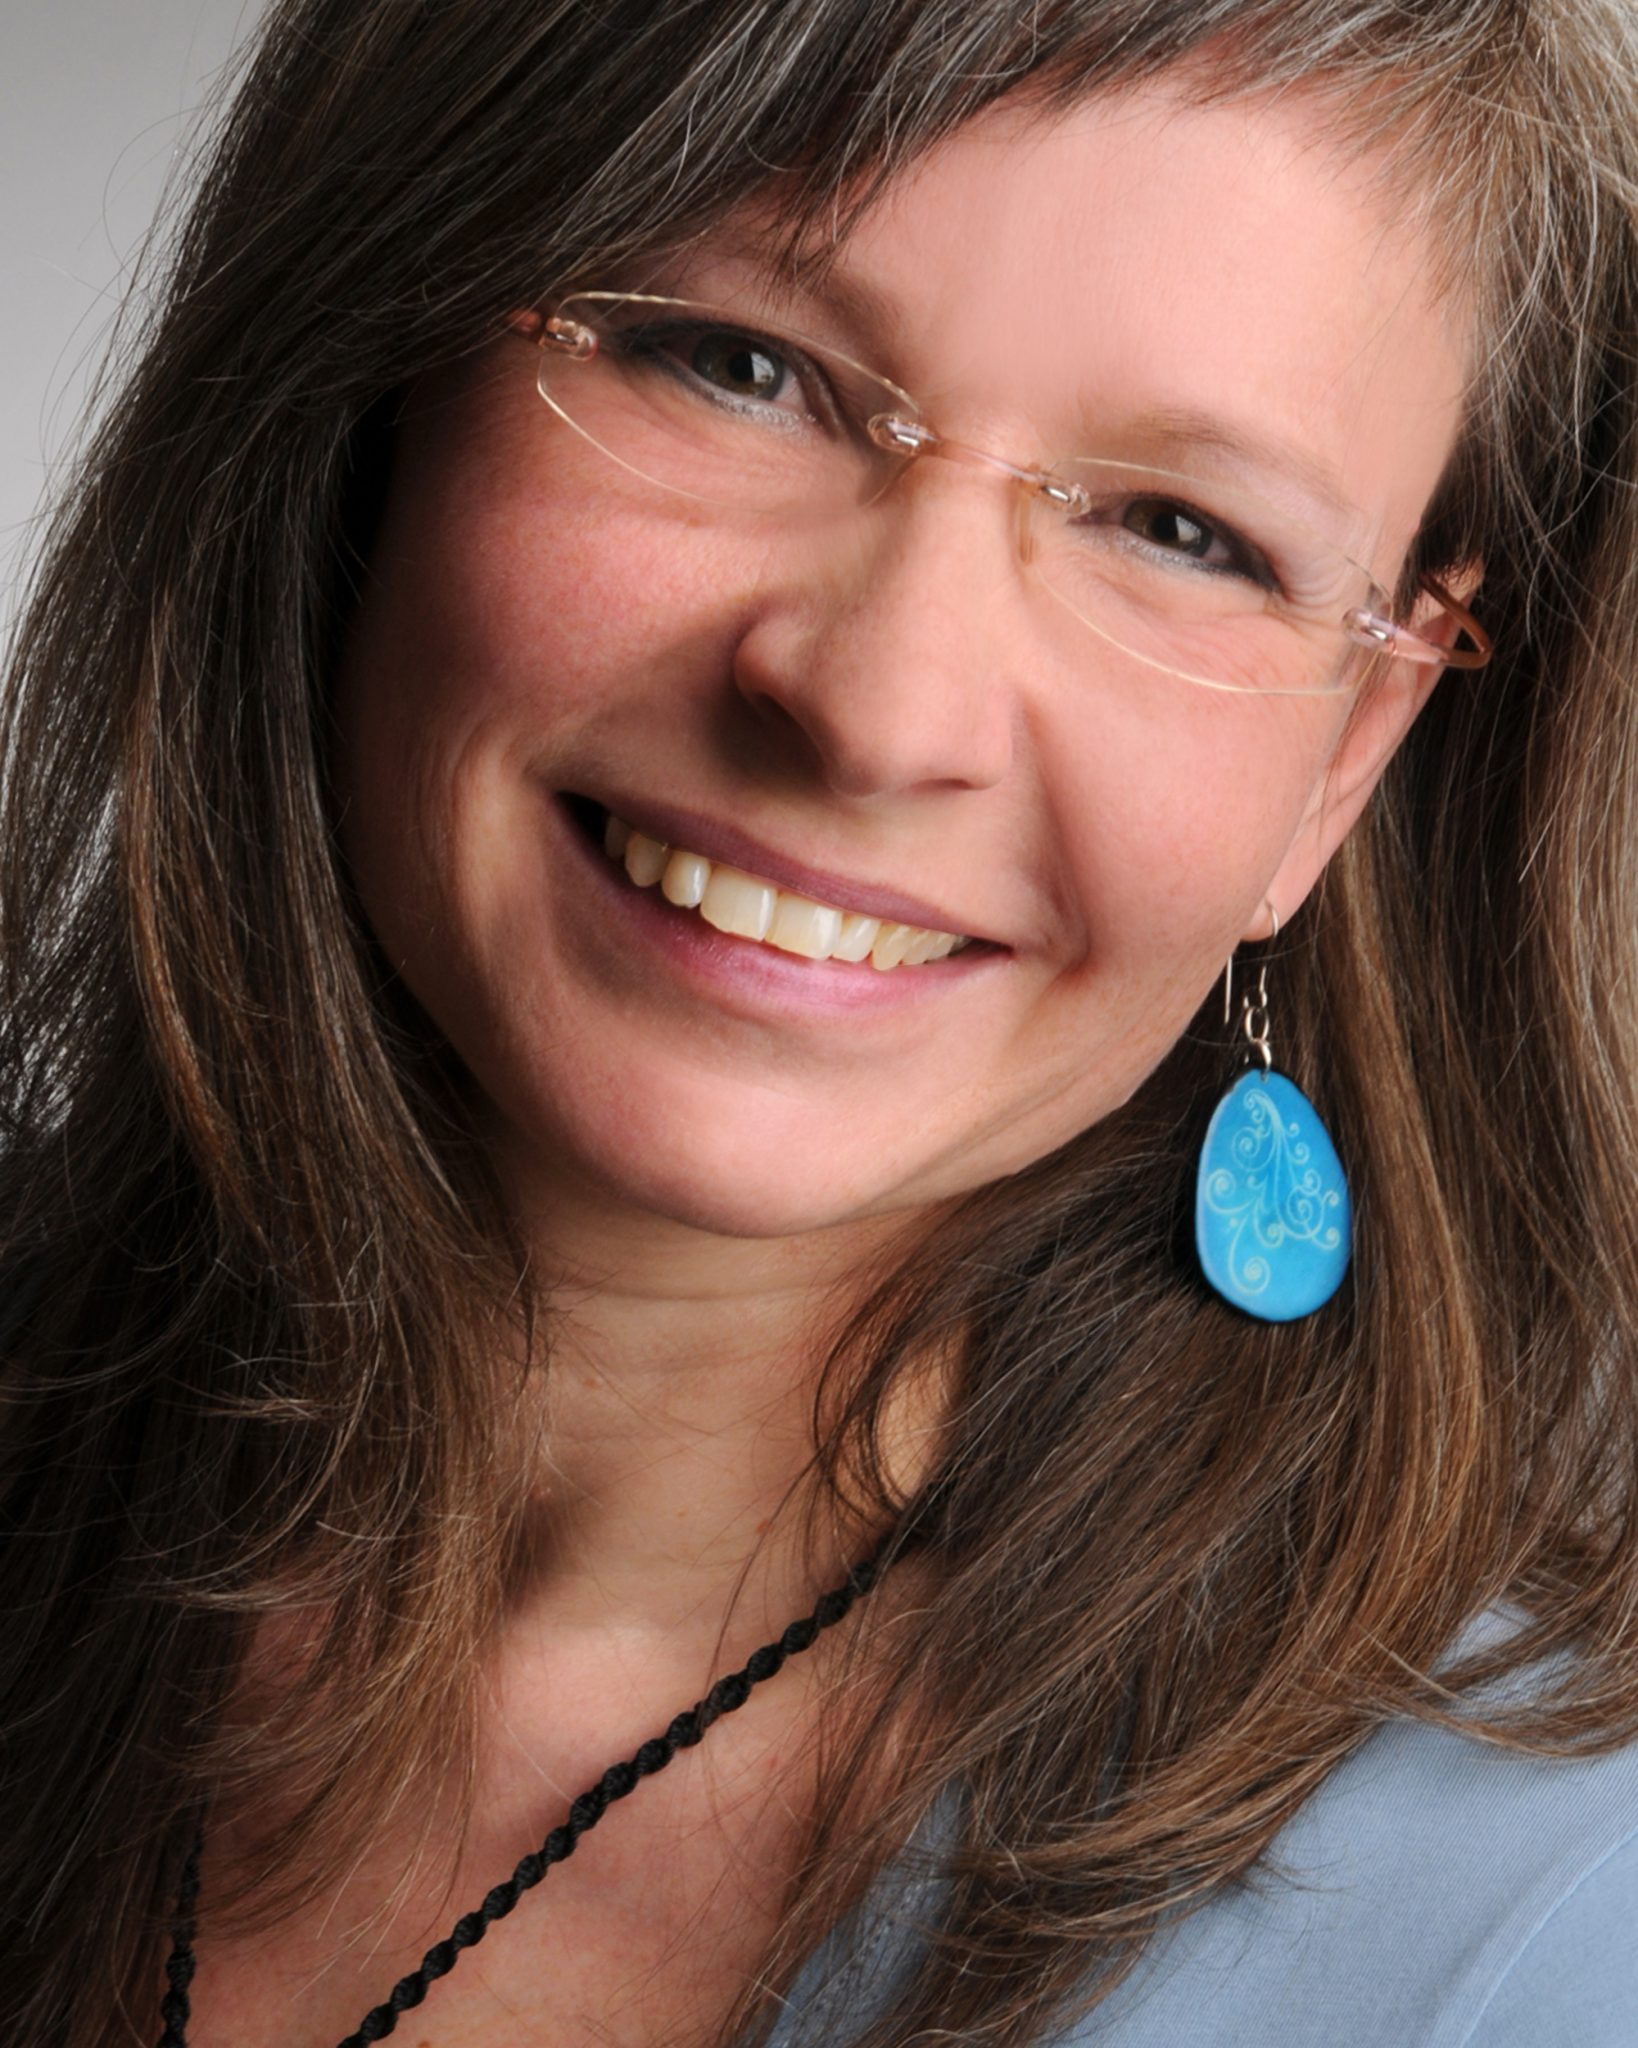 Astrid Gosch-Hagenkord